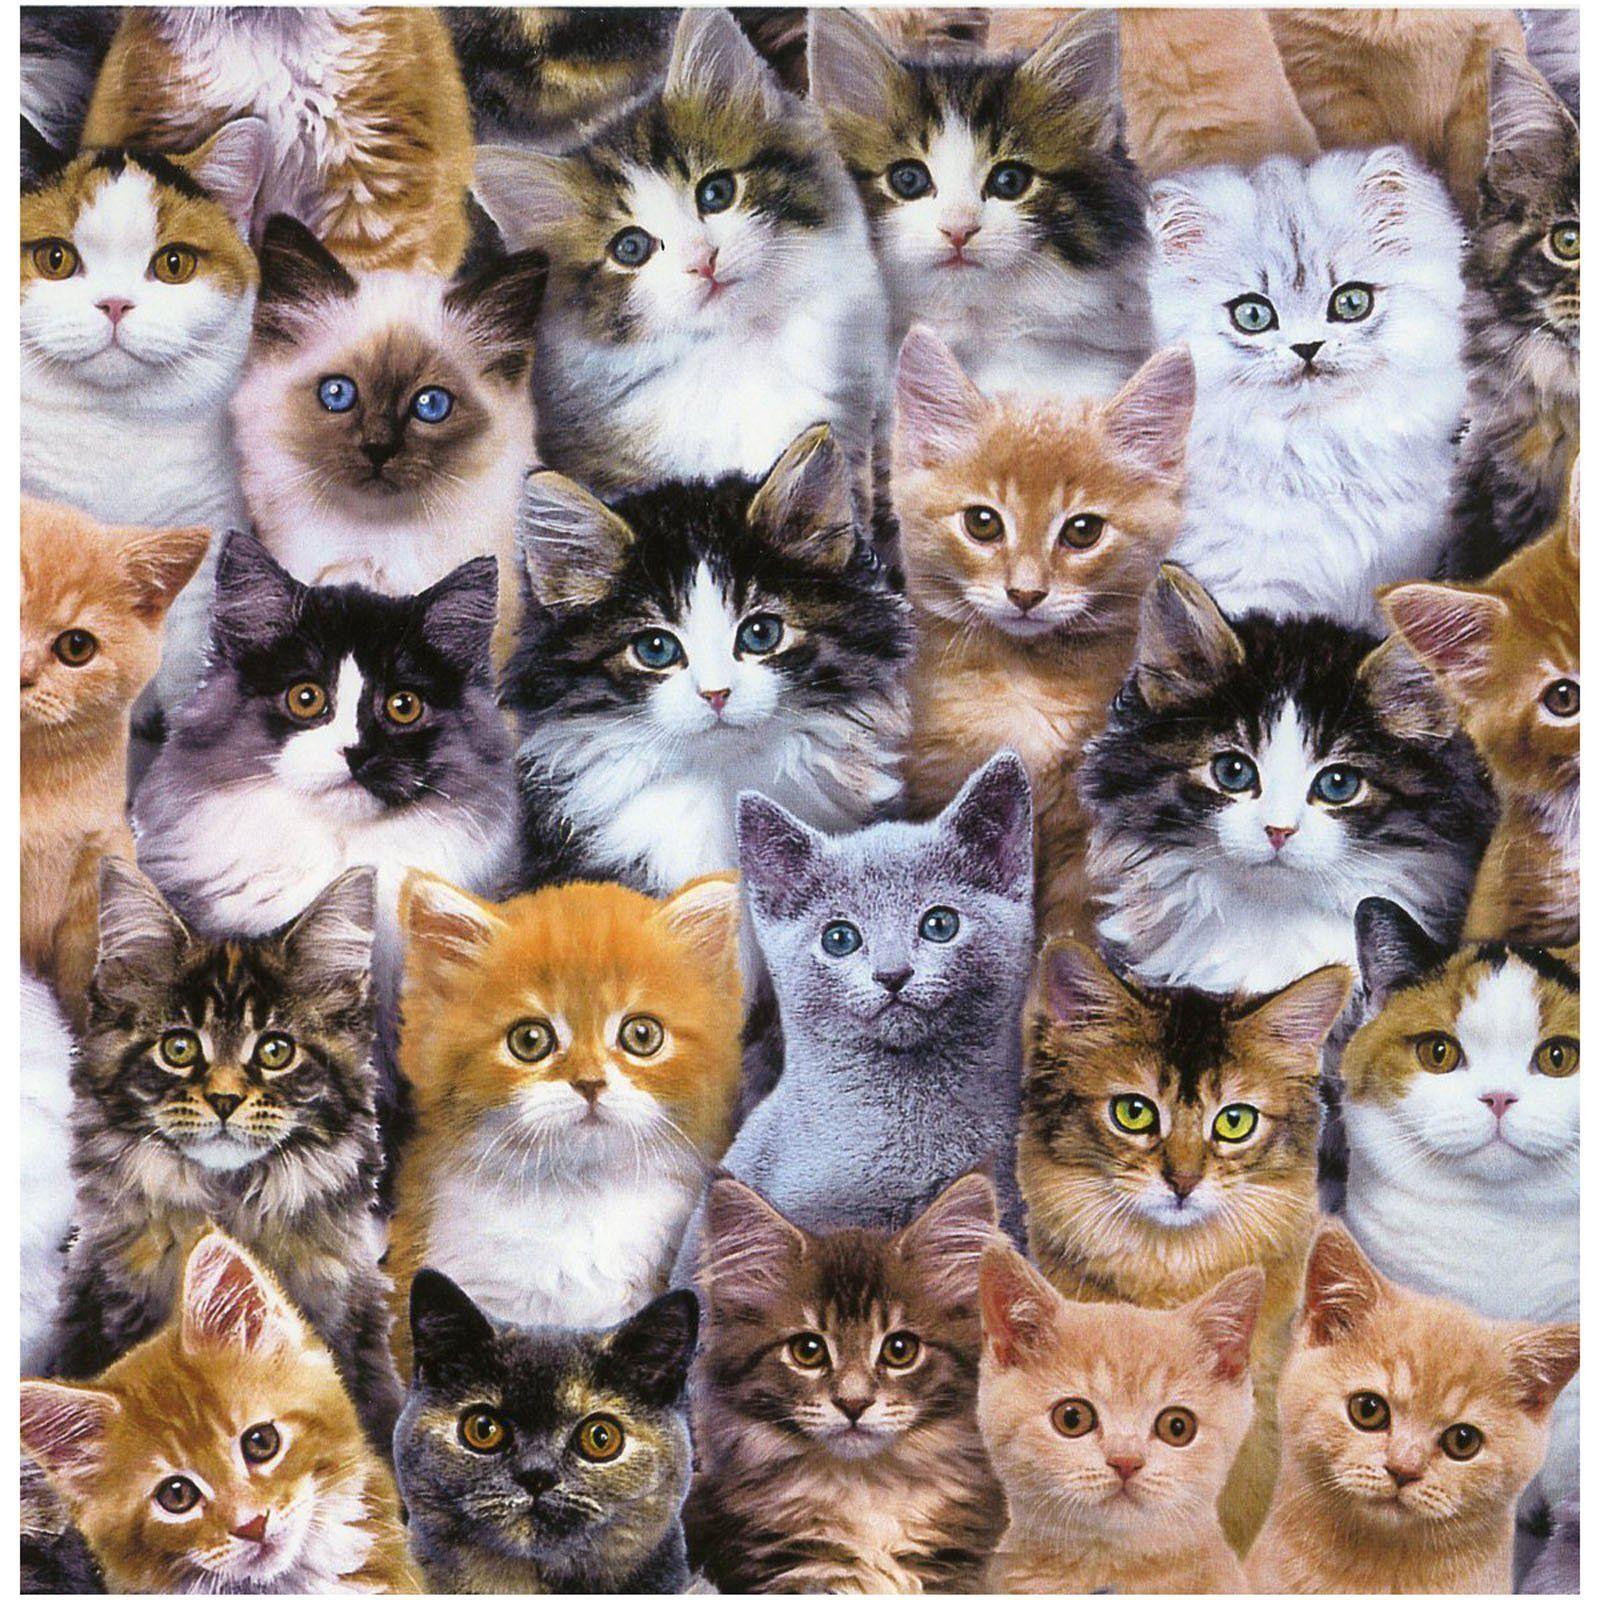 Cotton Quilting Sewing Fabric Elizabeths Studio Adorable Pets CATS CATS CATS